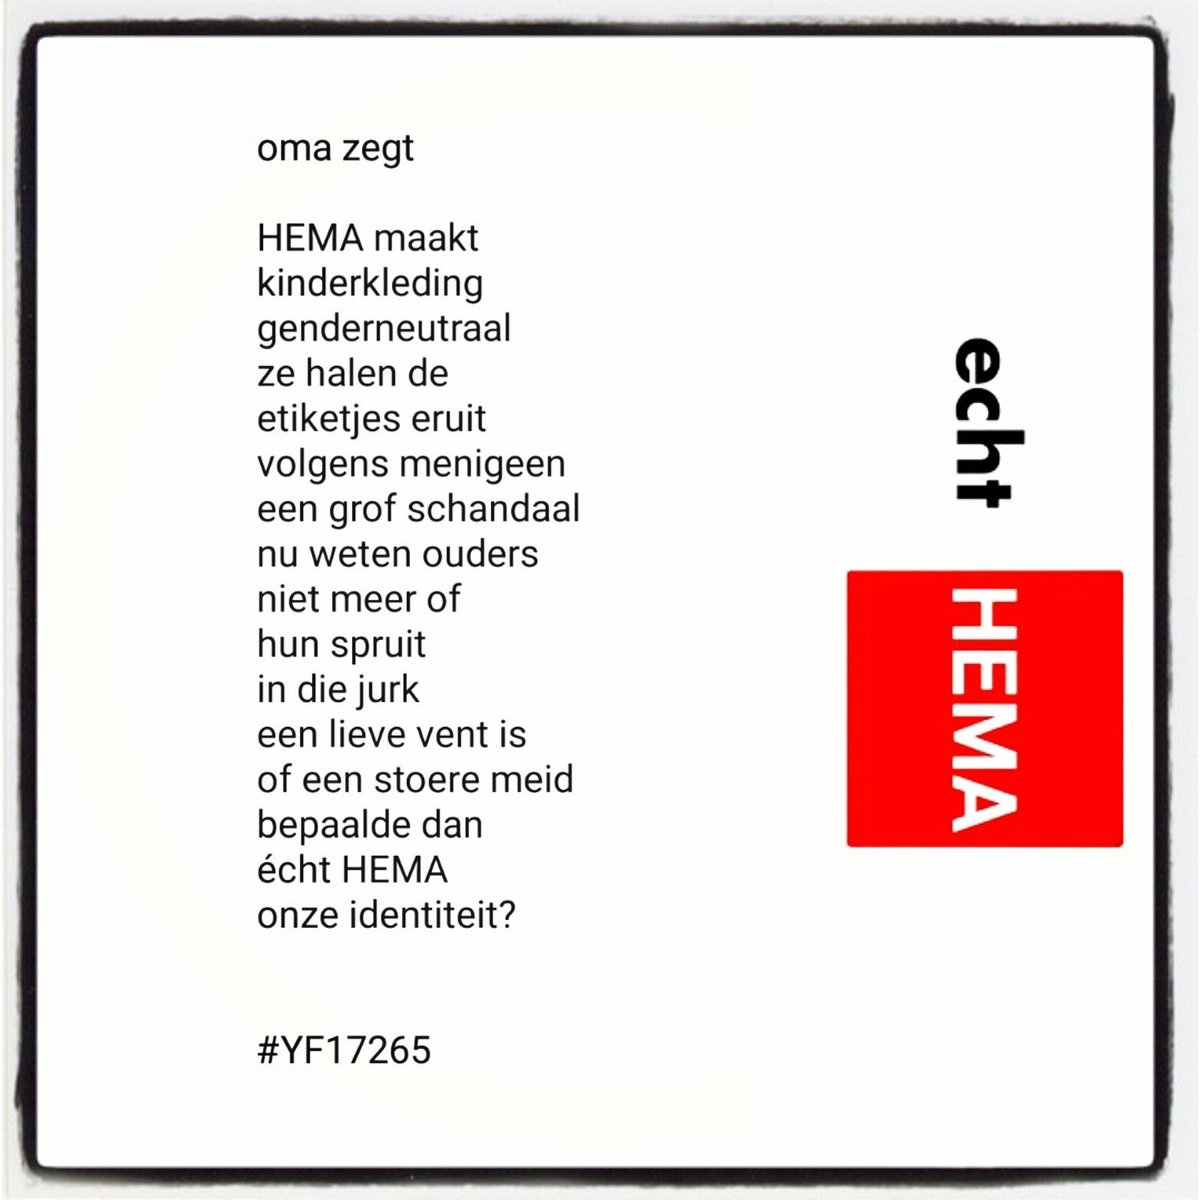 Yf17265 Hashtag On Twitter